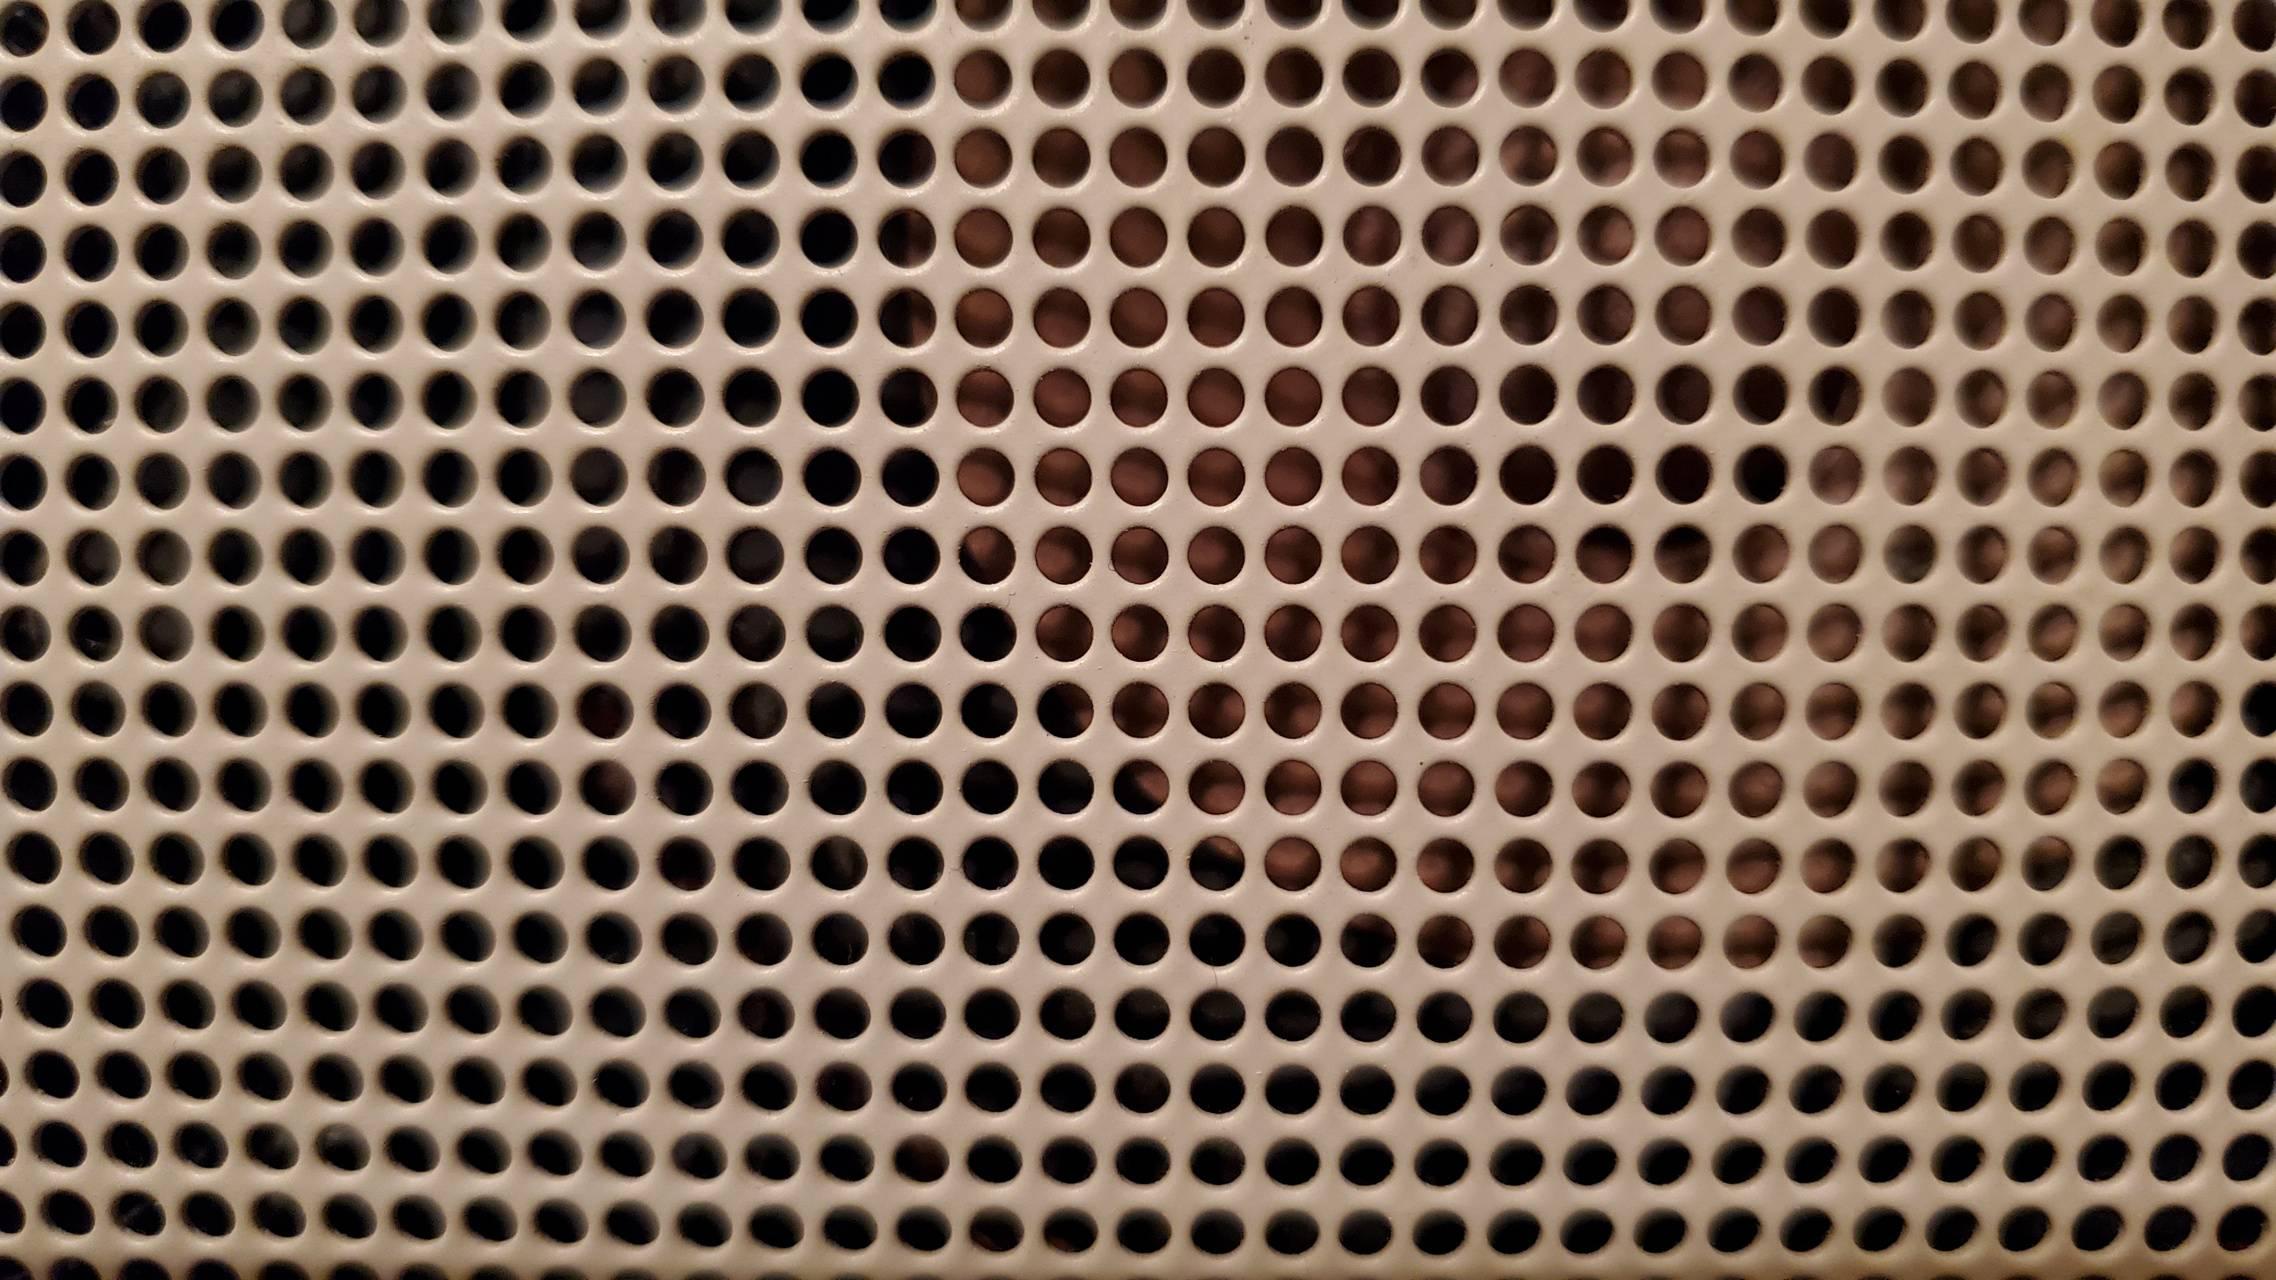 Holes n Dots